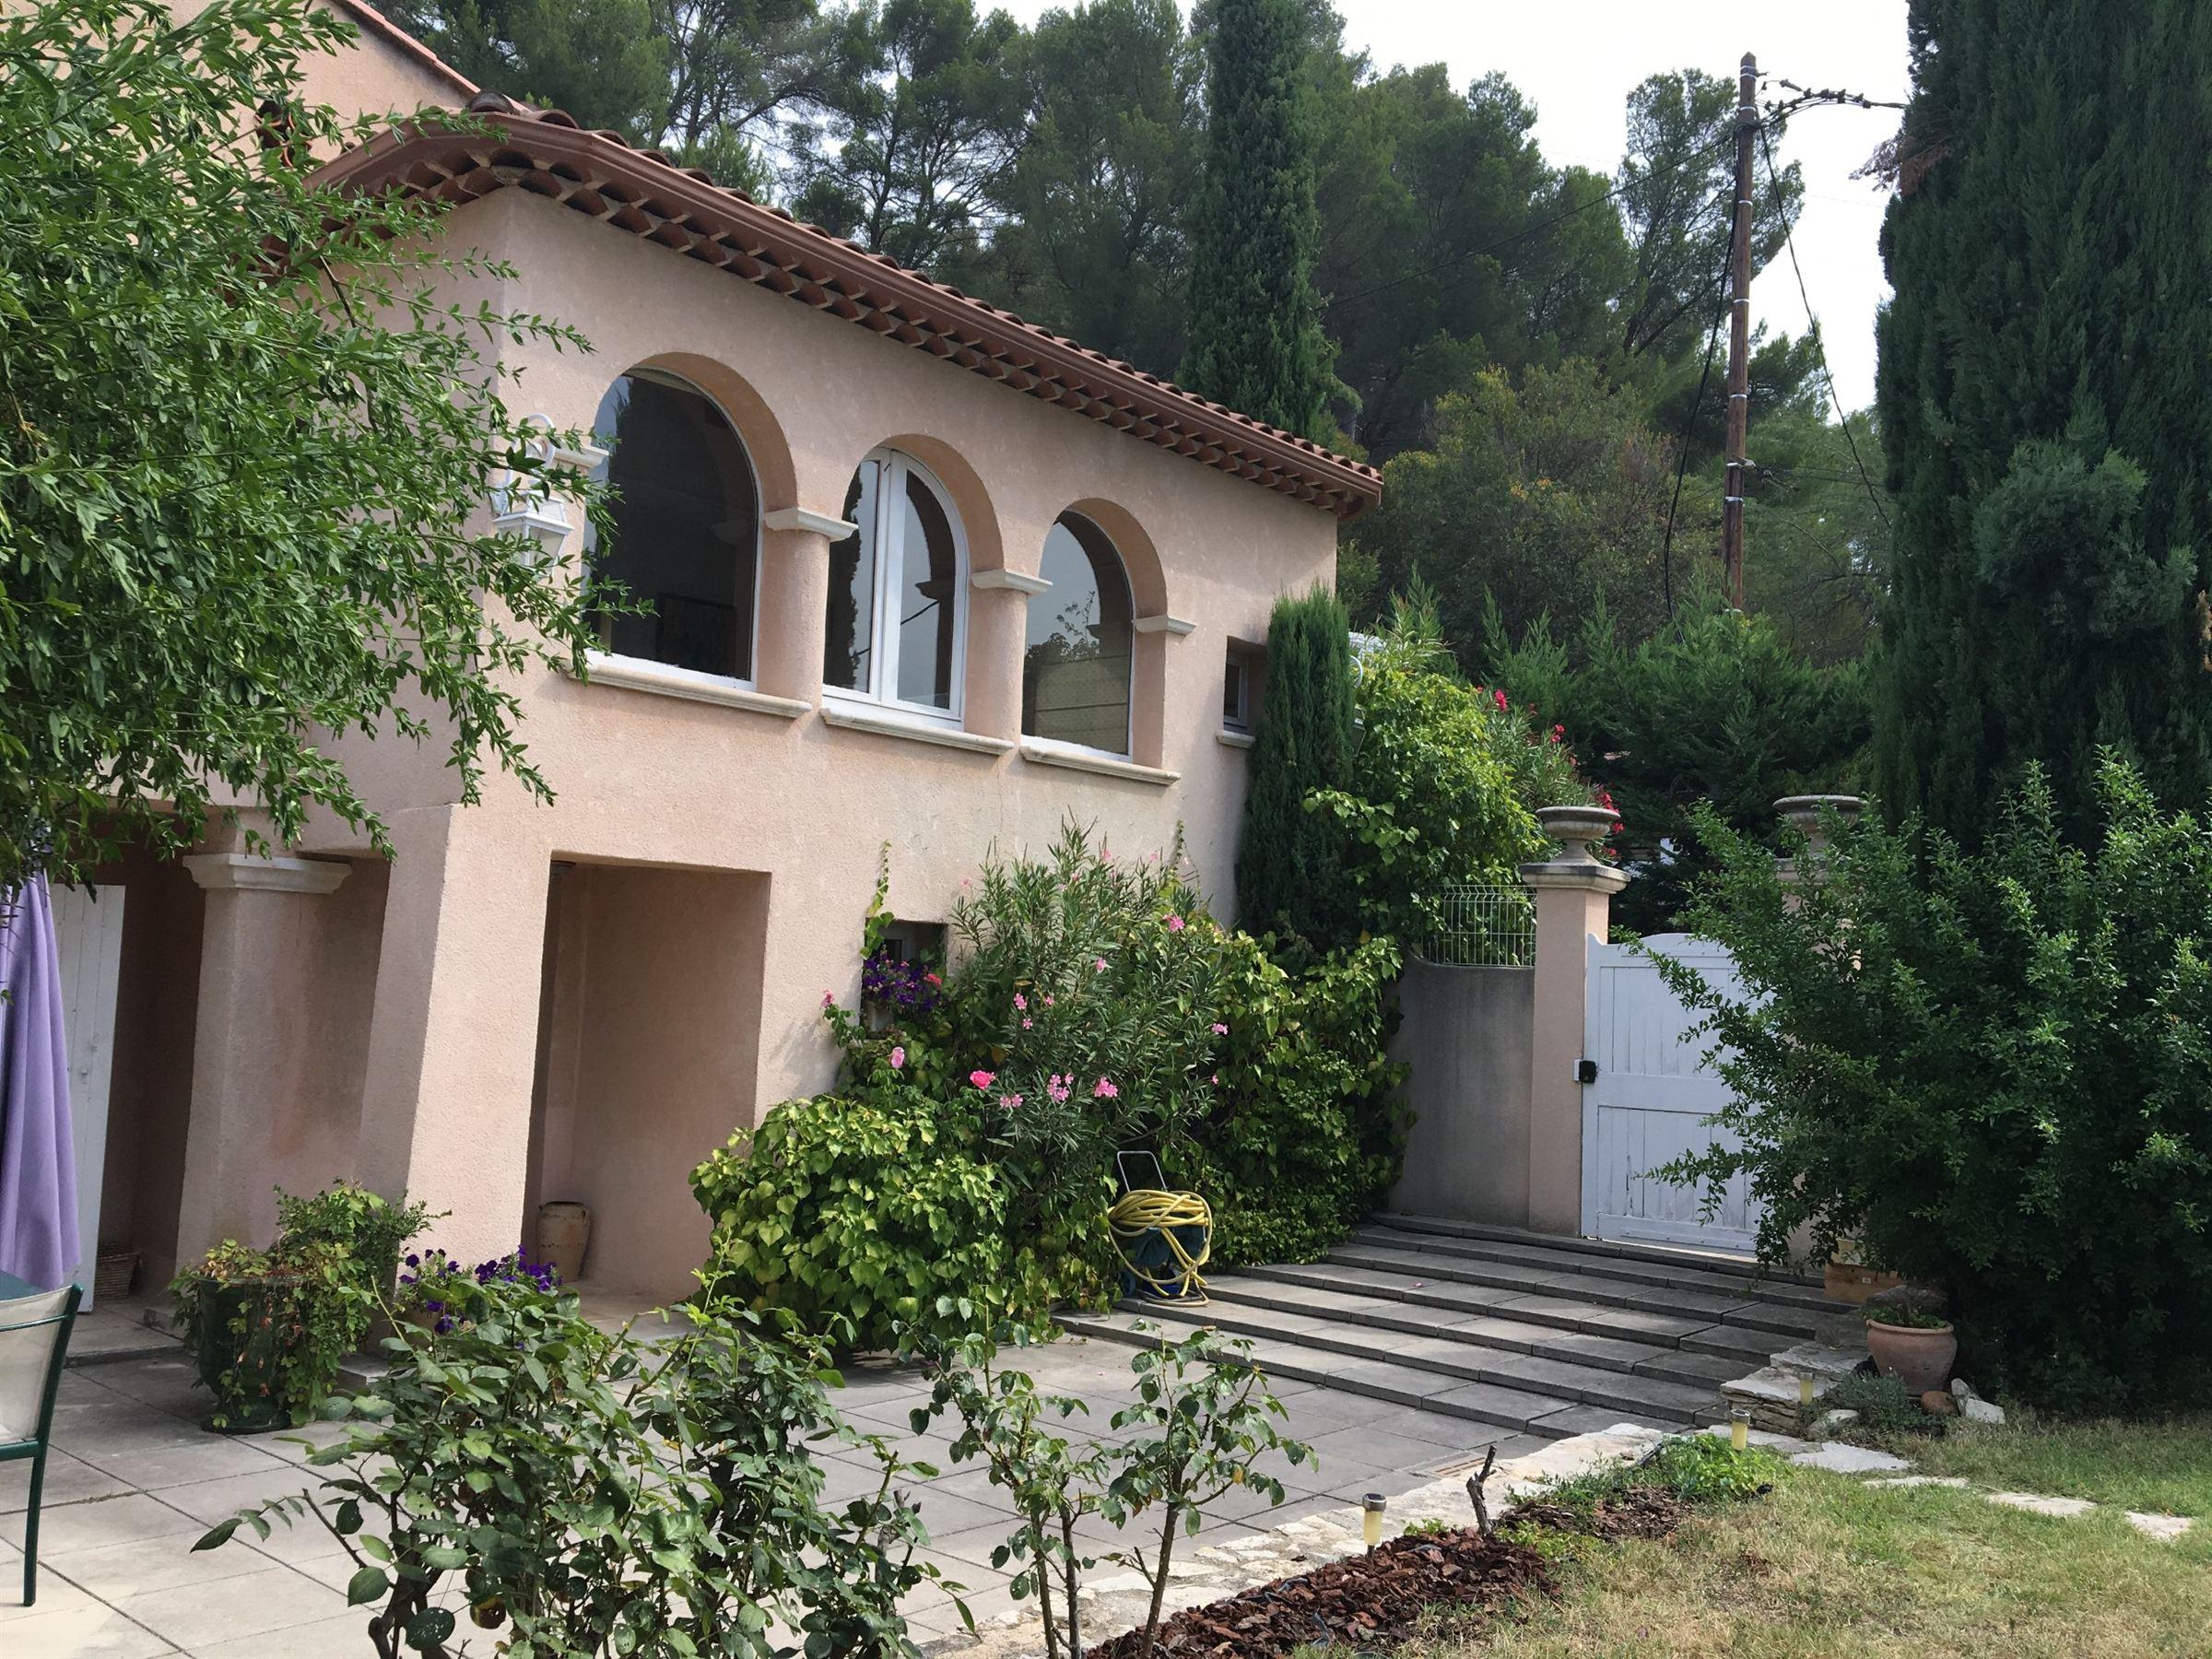 Casa Unifamiliar por un Venta en Villa Aix en Provence - Residiential aera Other Provence-Alpes-Cote D'Azur, Provincia - Alpes - Costa Azul, 13100 Francia